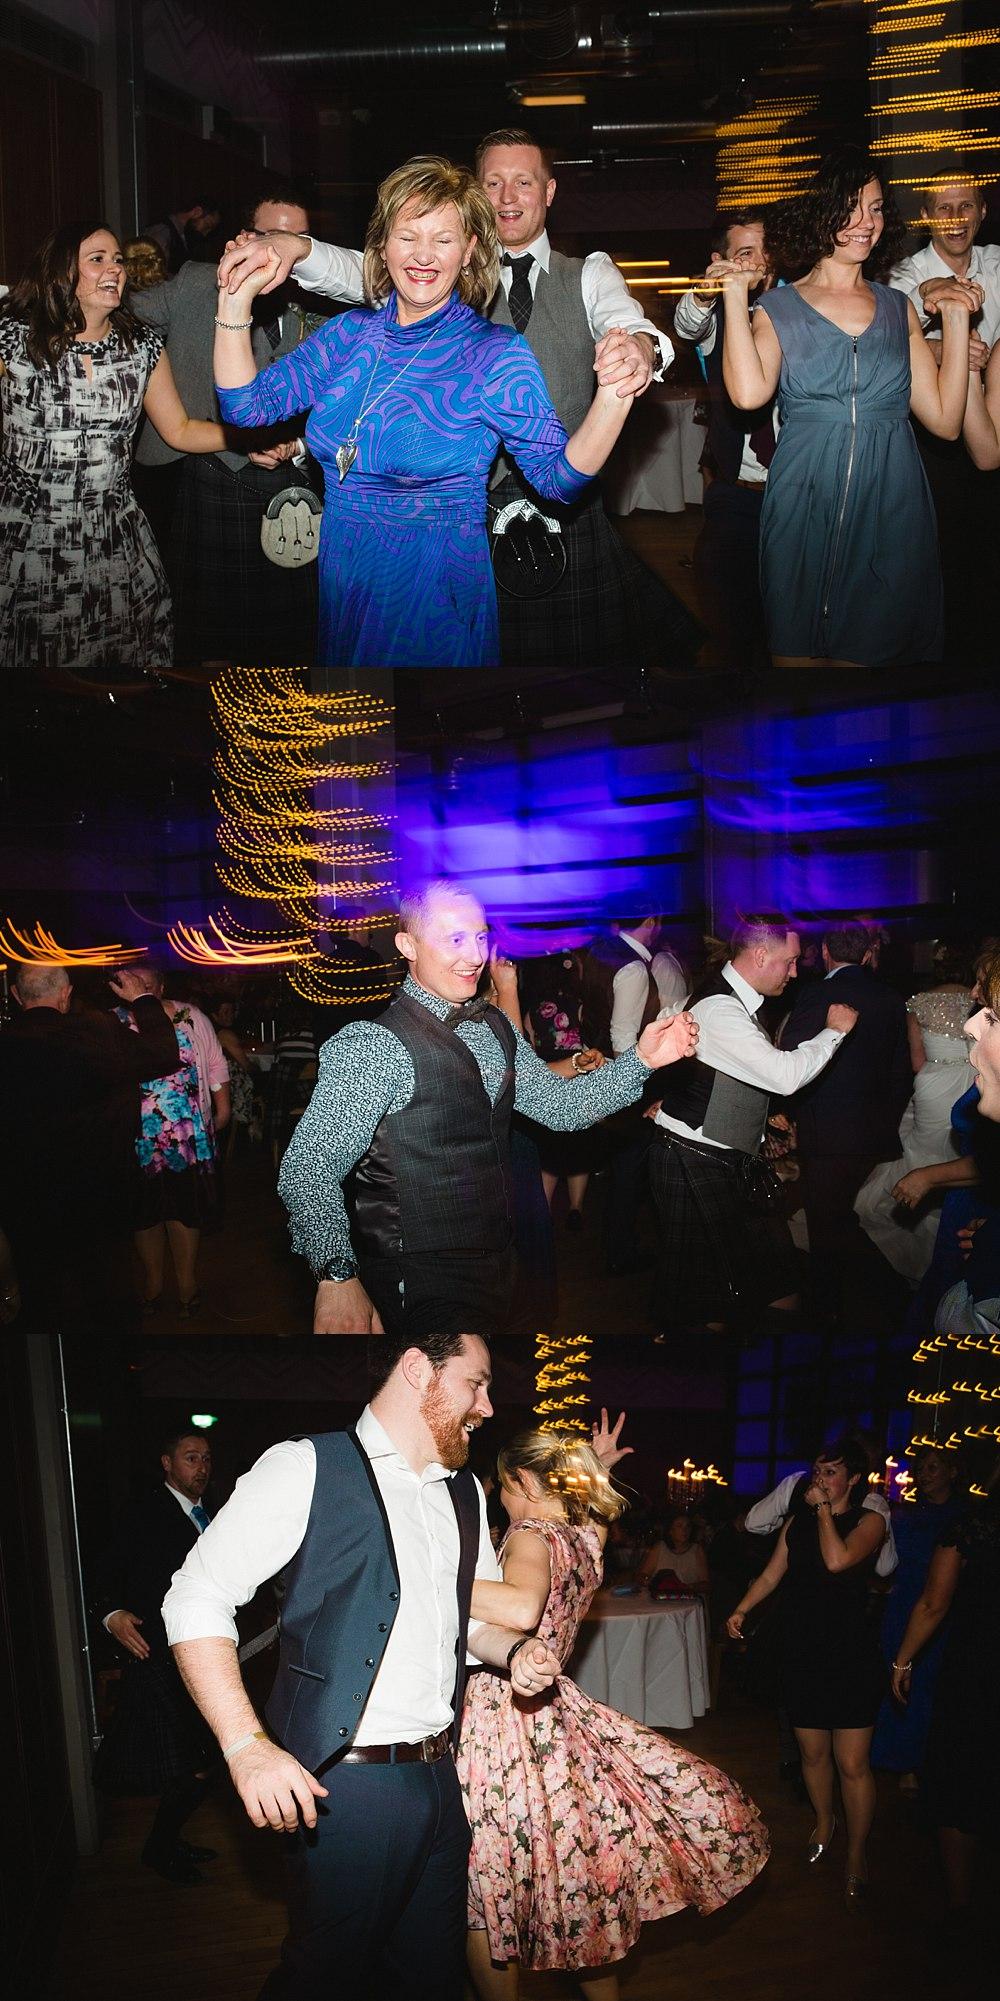 Fine Art Wedding Photographers,The Gibsons,natural wedding photographers,natural wedding photographers Glasgow,romantic photographers Scotland,romantic wedding photographers,two wedding photographers scotland,wedding photographers glasgow,west brewery wedding,